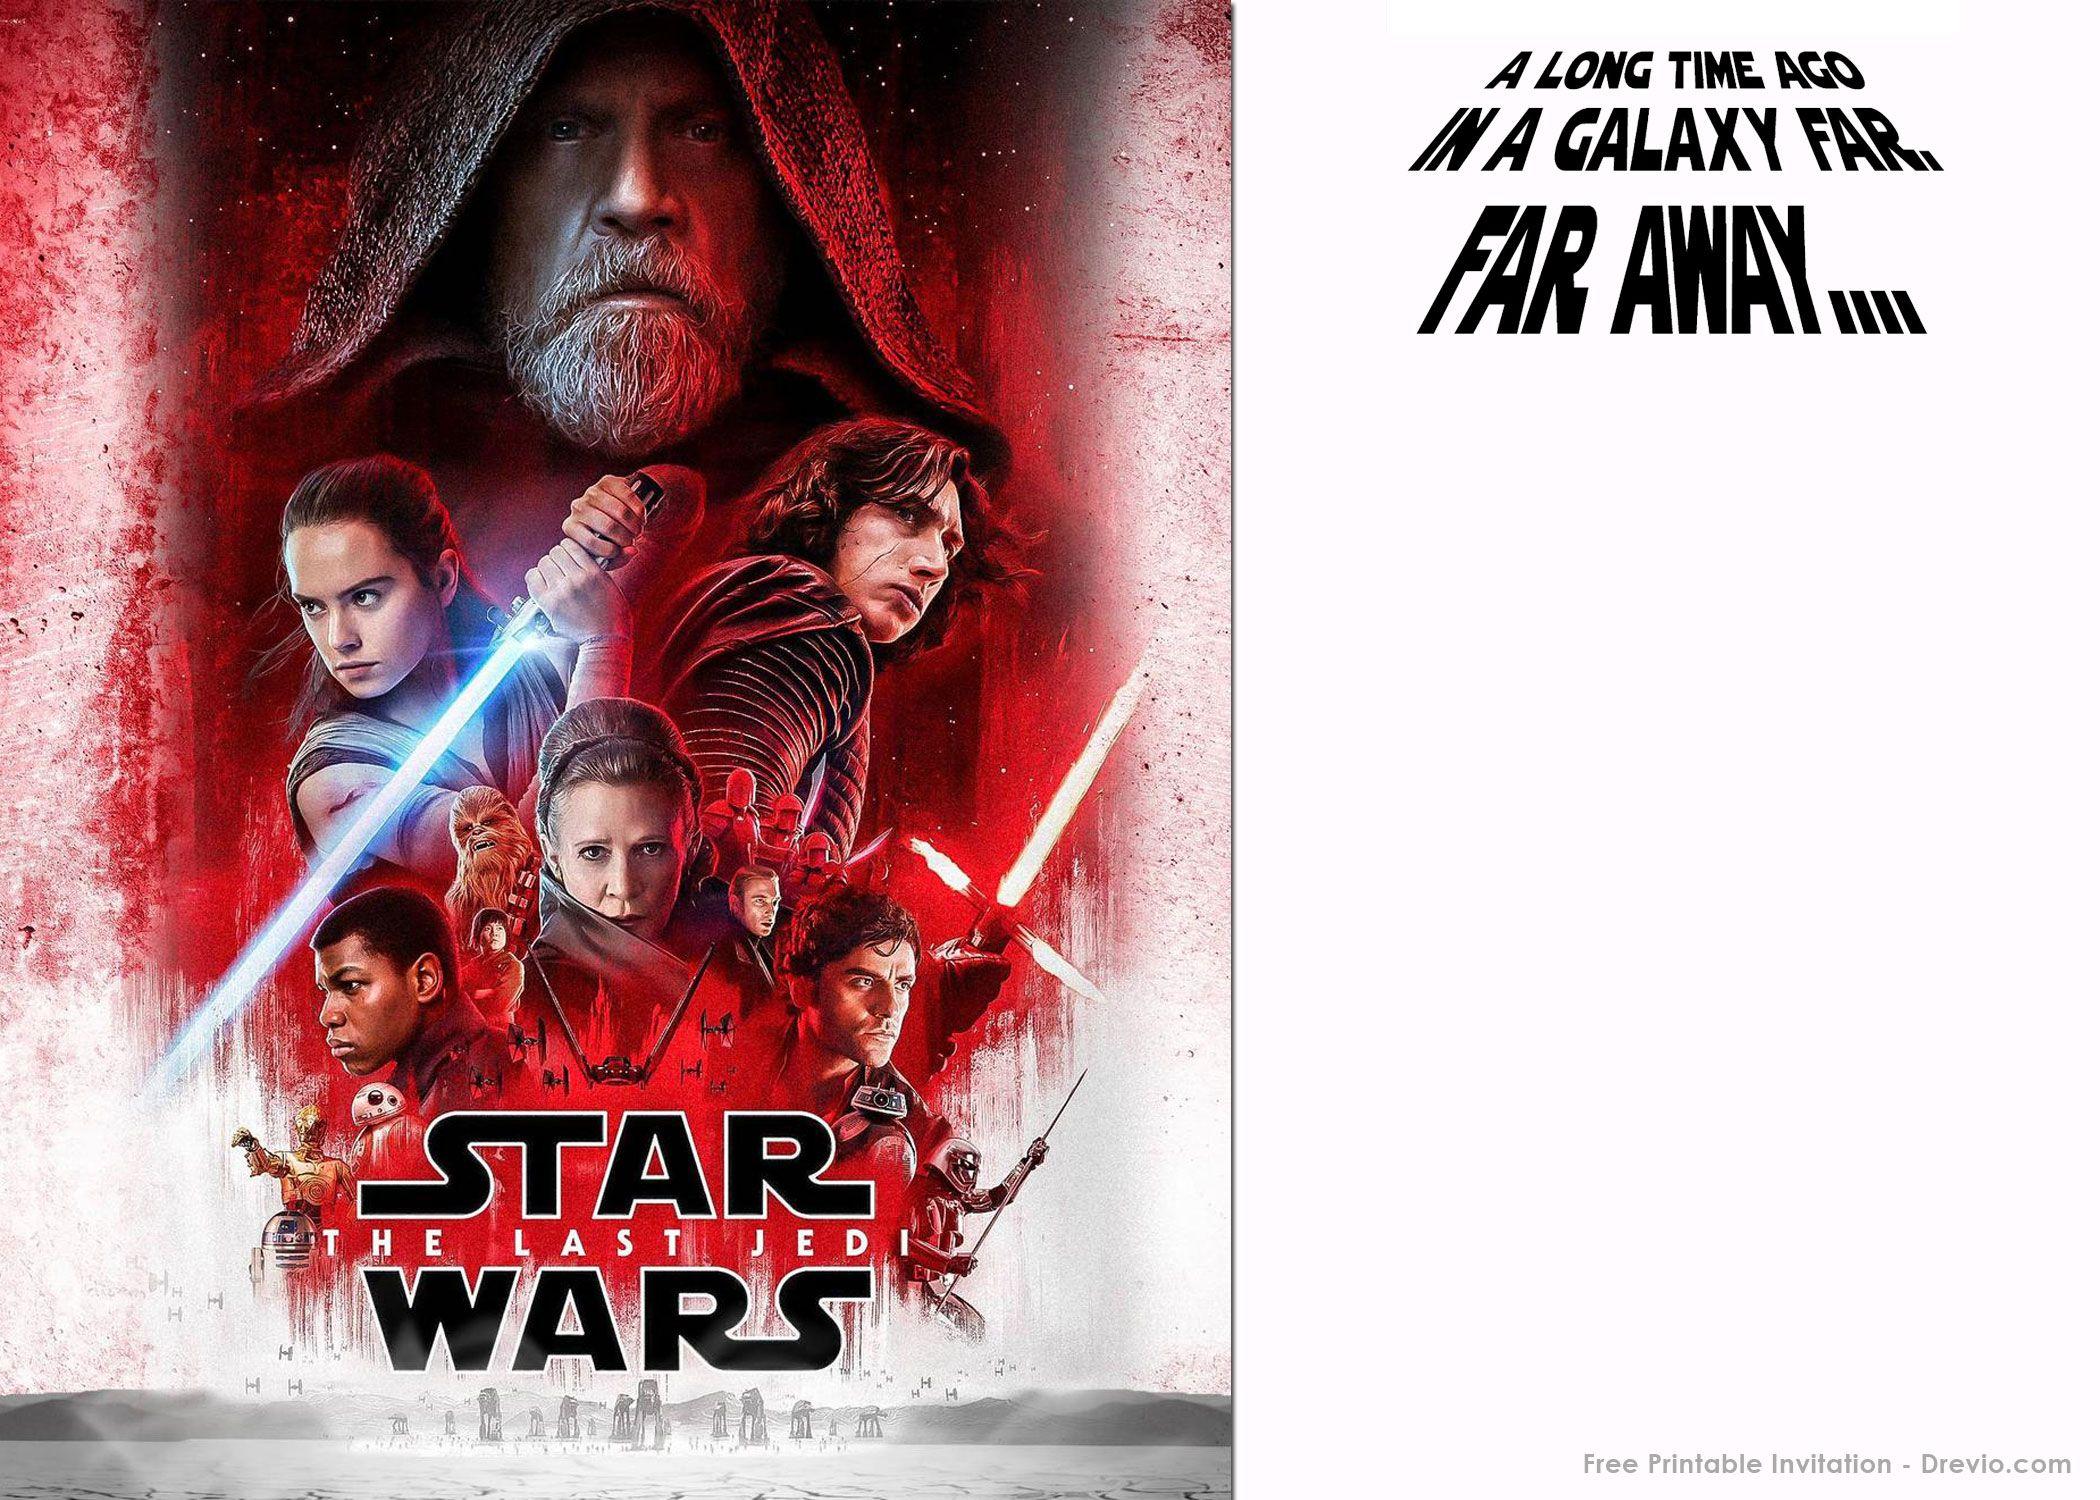 Get FREE Printable Star Wars The Last Jedi Invitation Template